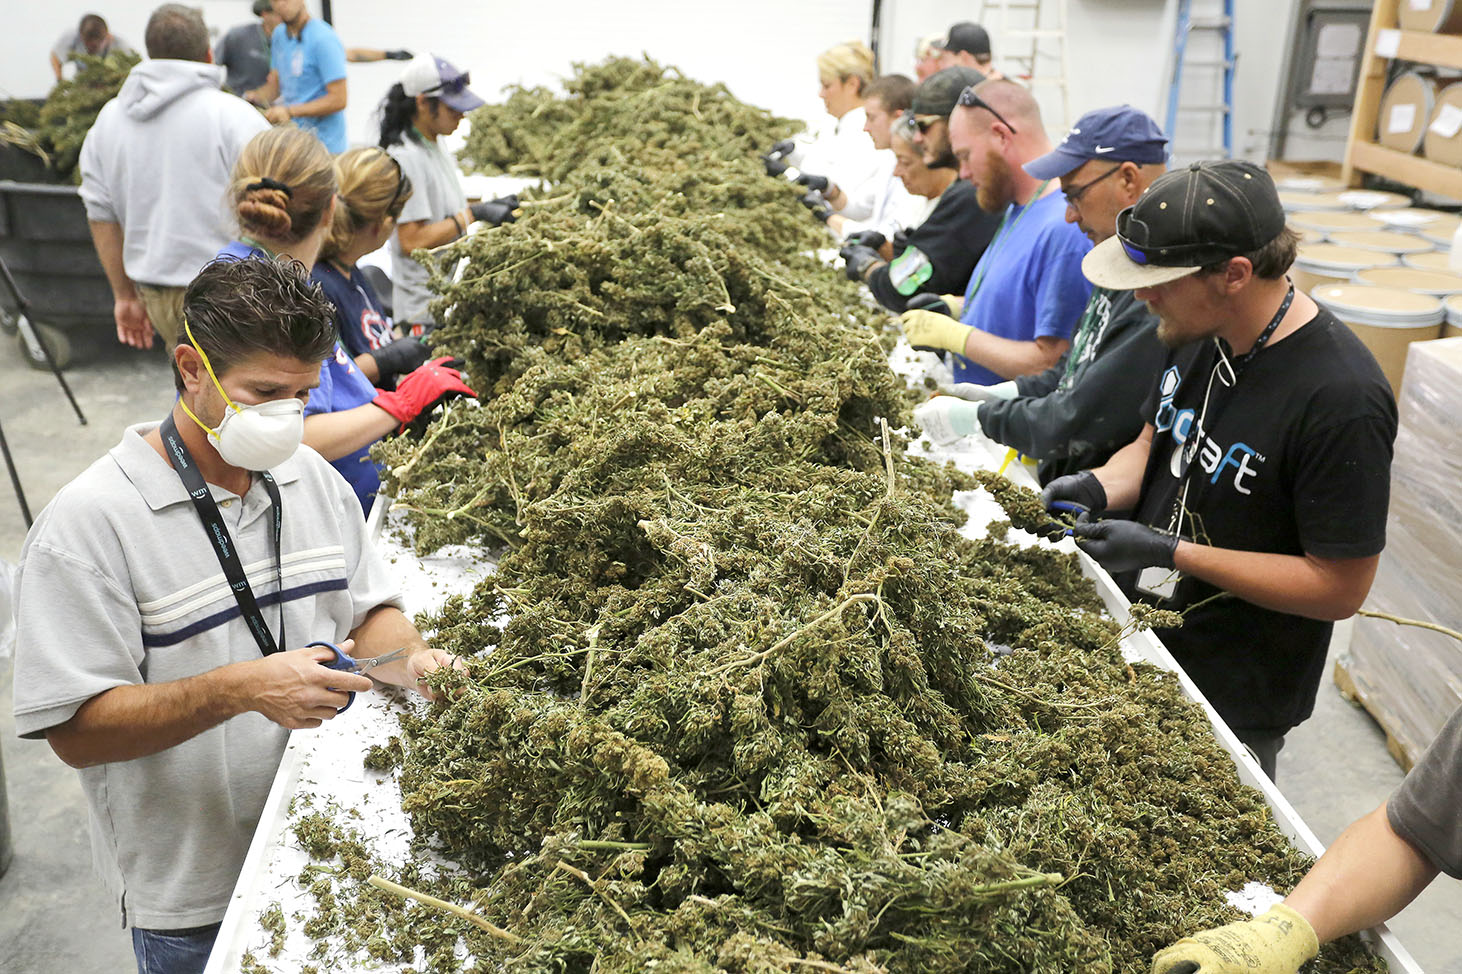 Workshops for marijuana business